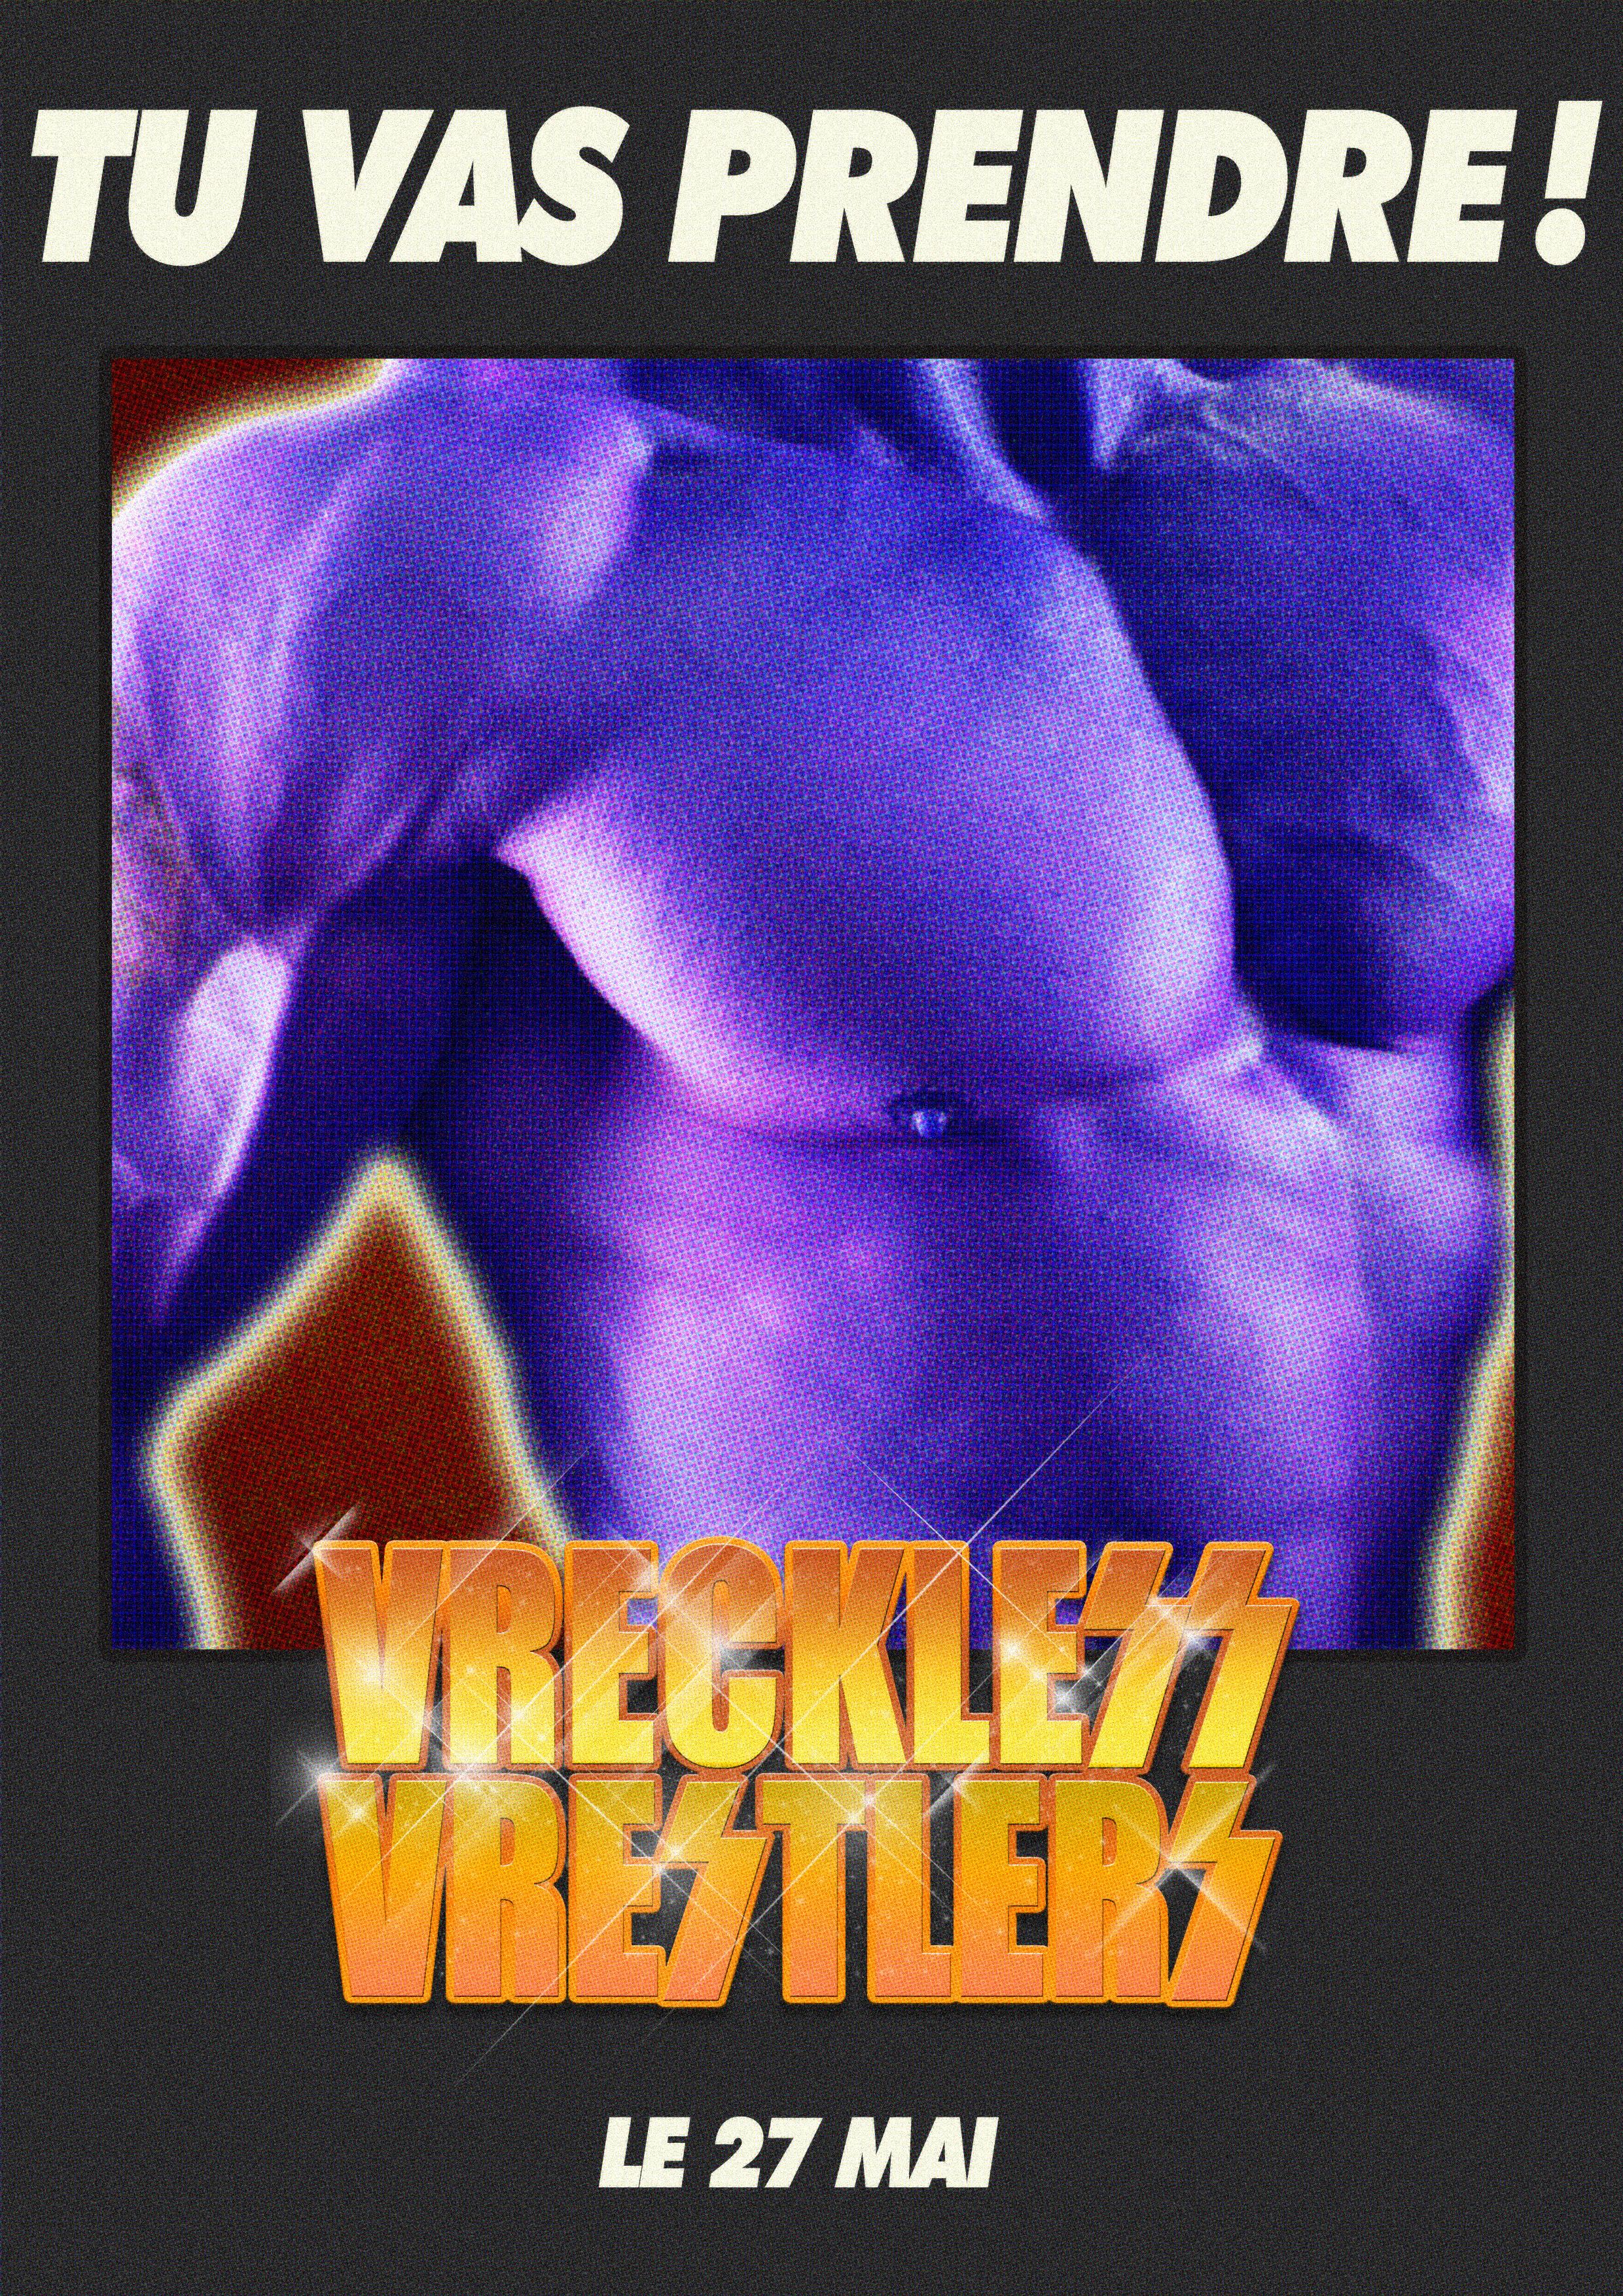 vreckless vrestlers wetta fb teaser 02